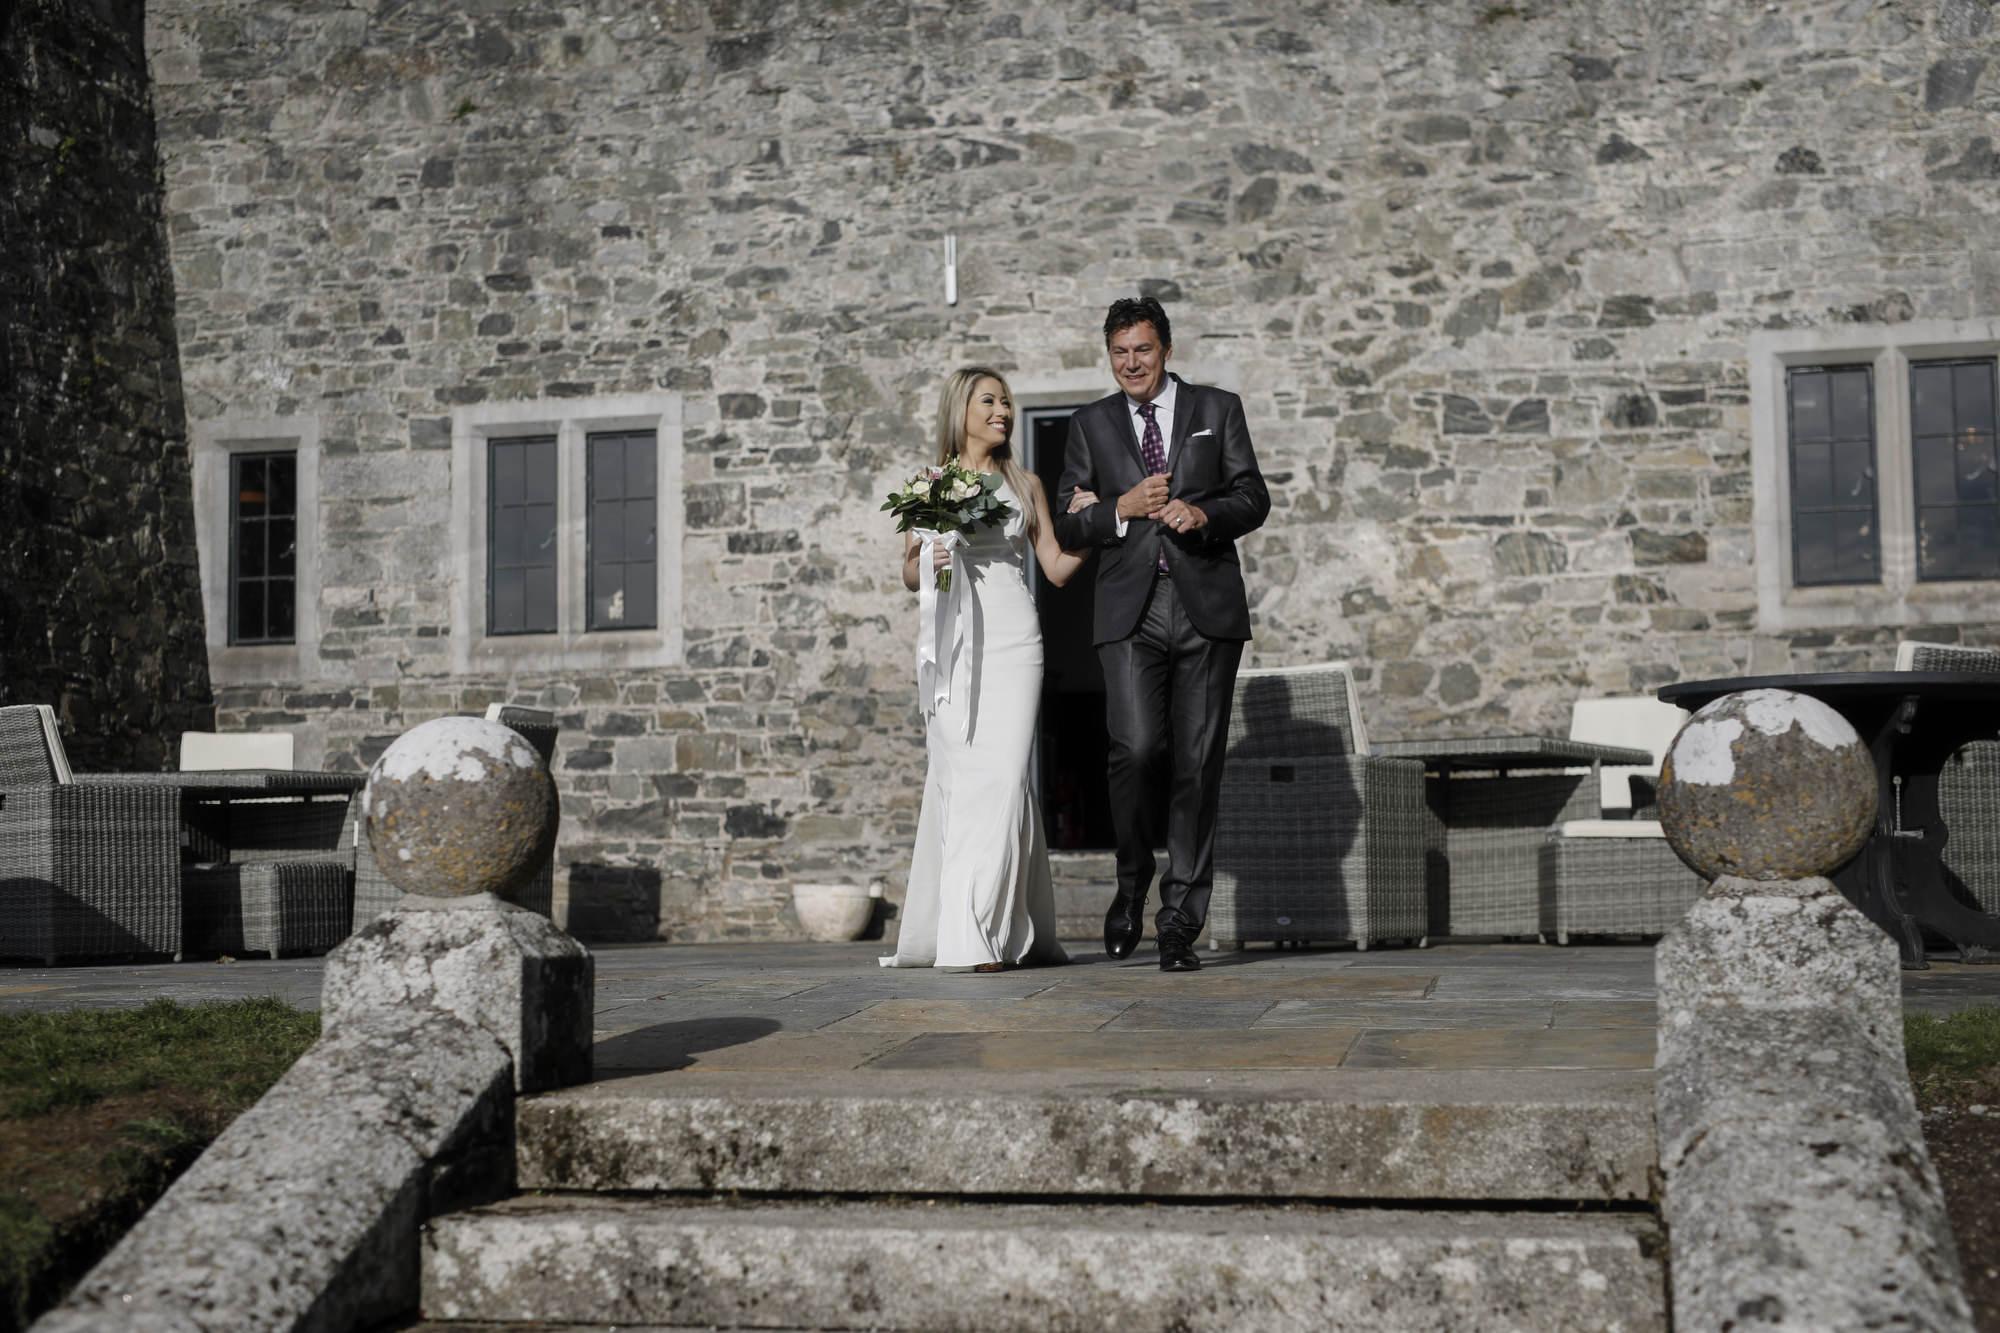 kilkea_castle_wedding_photographer_goldenmoments_021.jpg